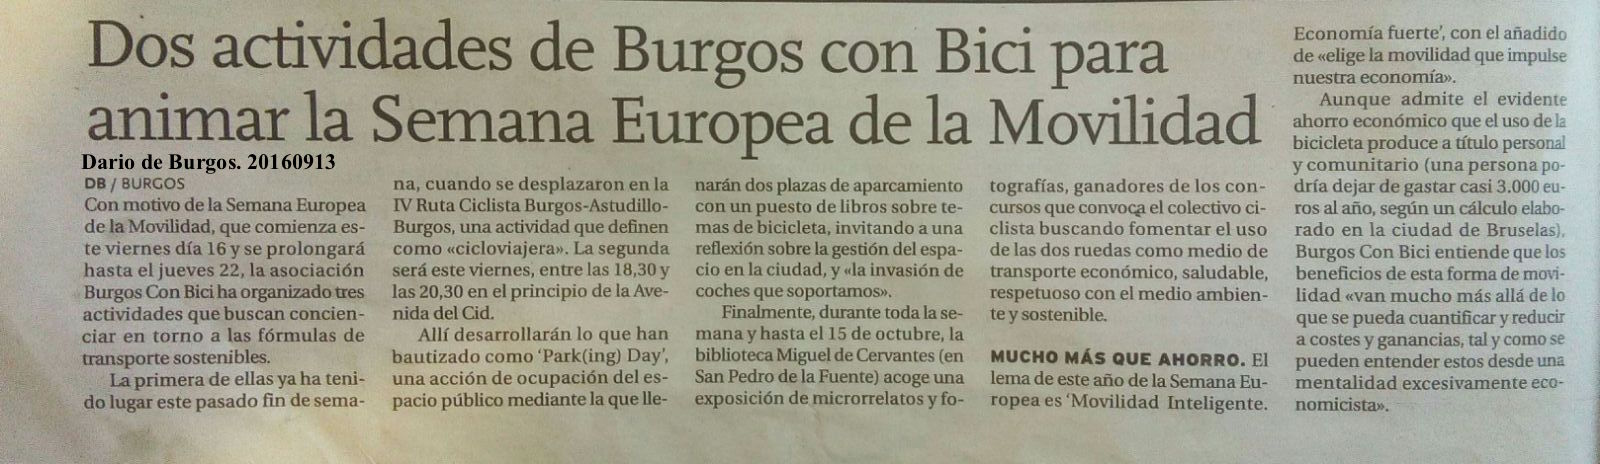 SEM BCB en Diario de Burgos